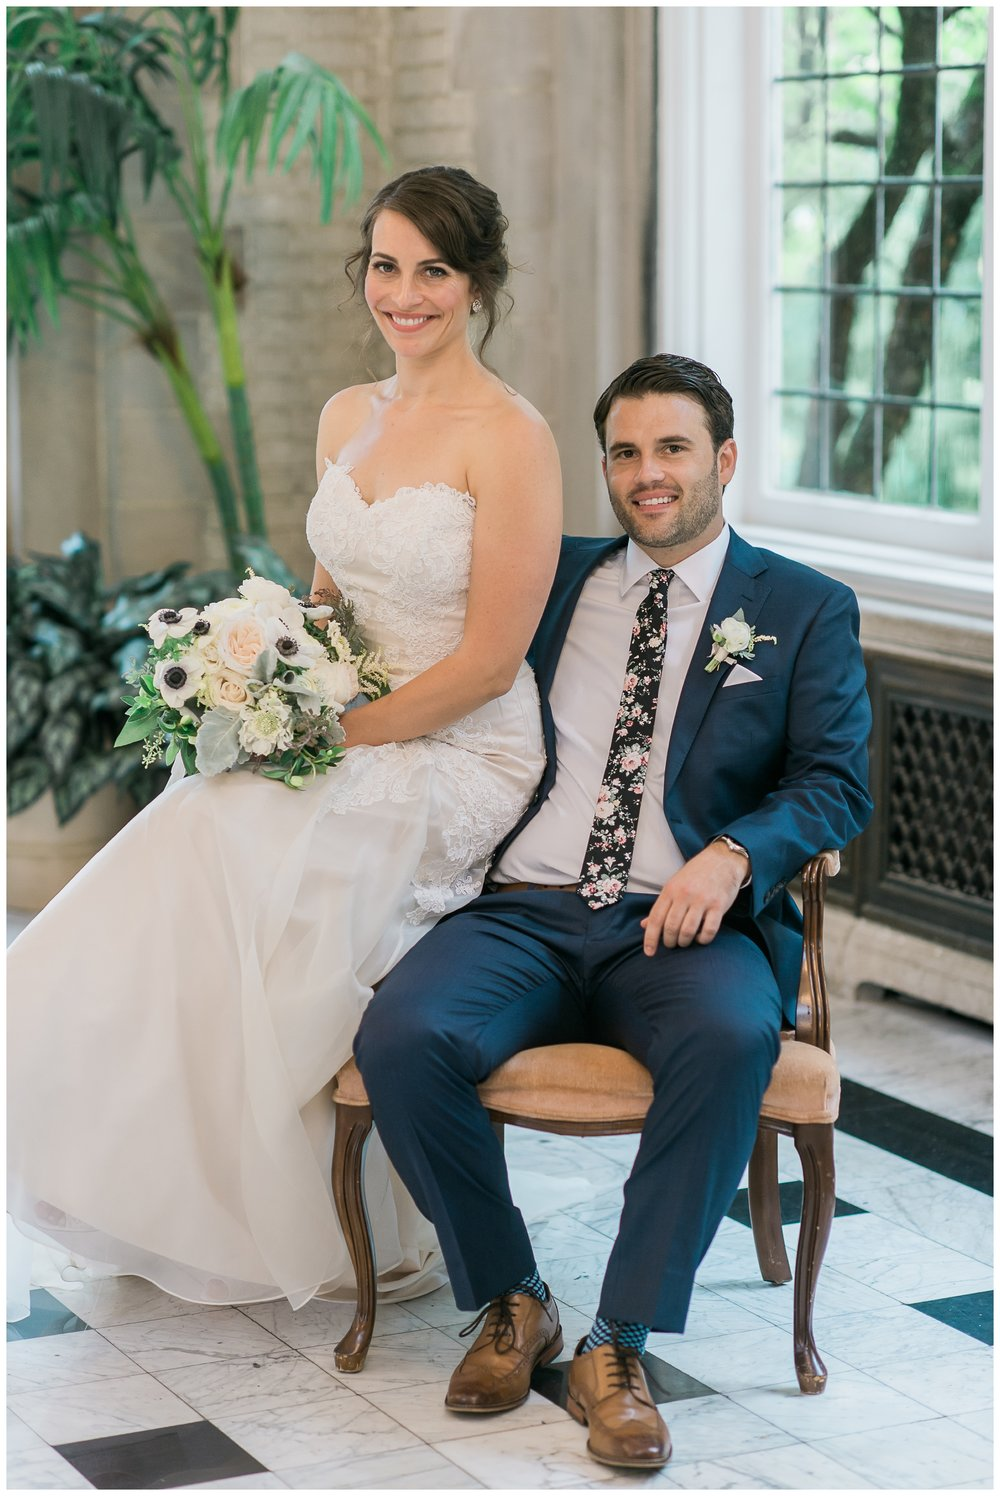 Rebecca_Bridges_Photography_Indianapolis_Wedding_Photographer_5196.jpg